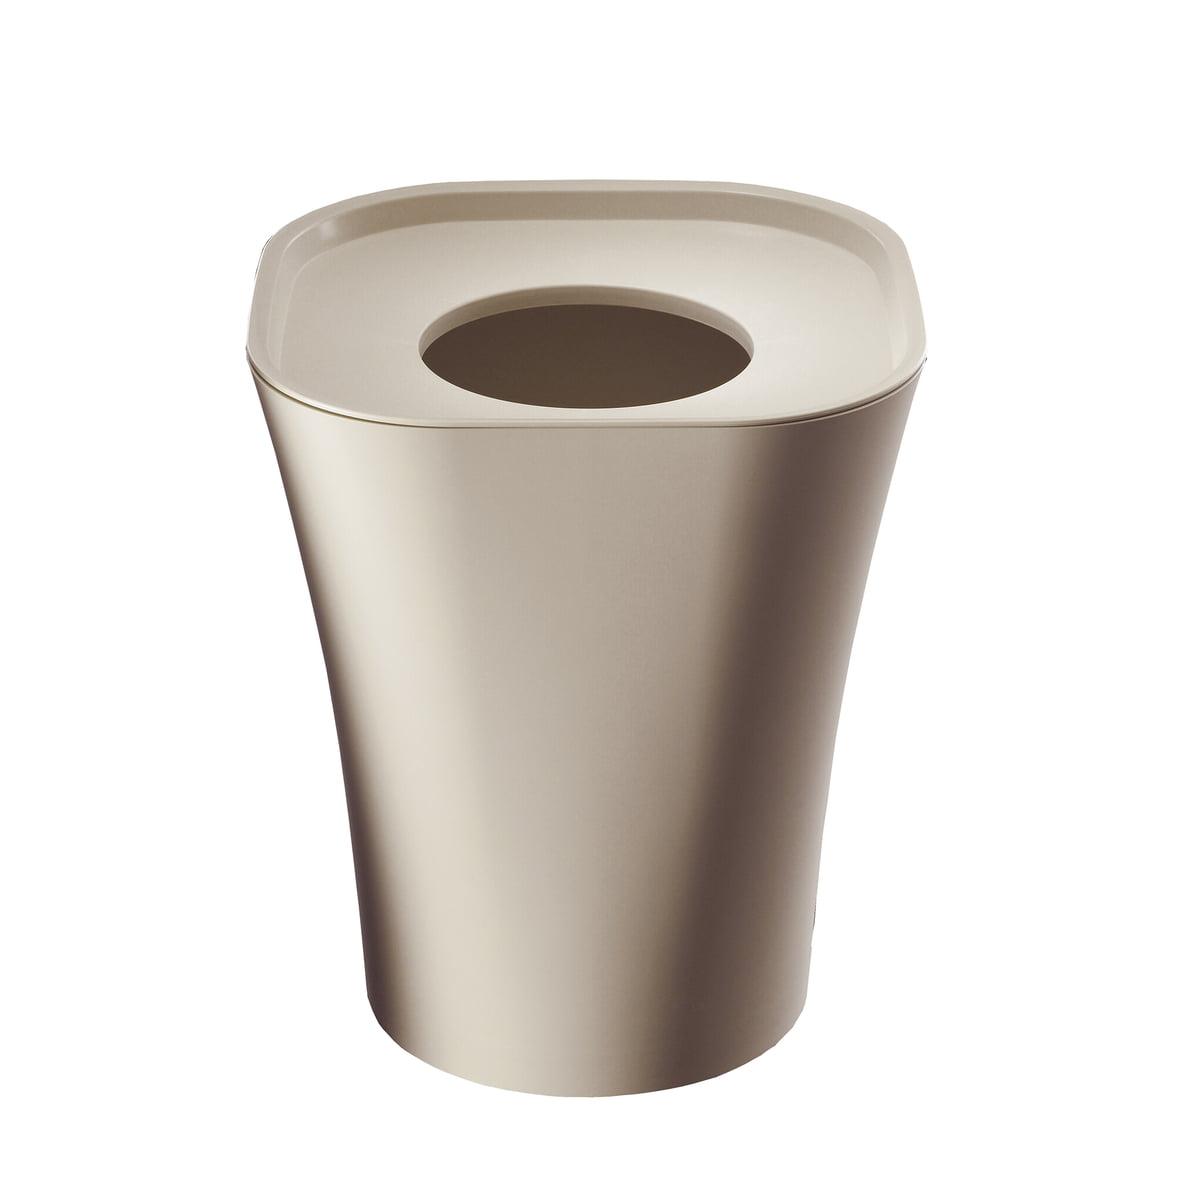 Magis - Trash Papierkorb groß, beige | Büro > Papierkörbe | Beige | Polypropylen | Magis